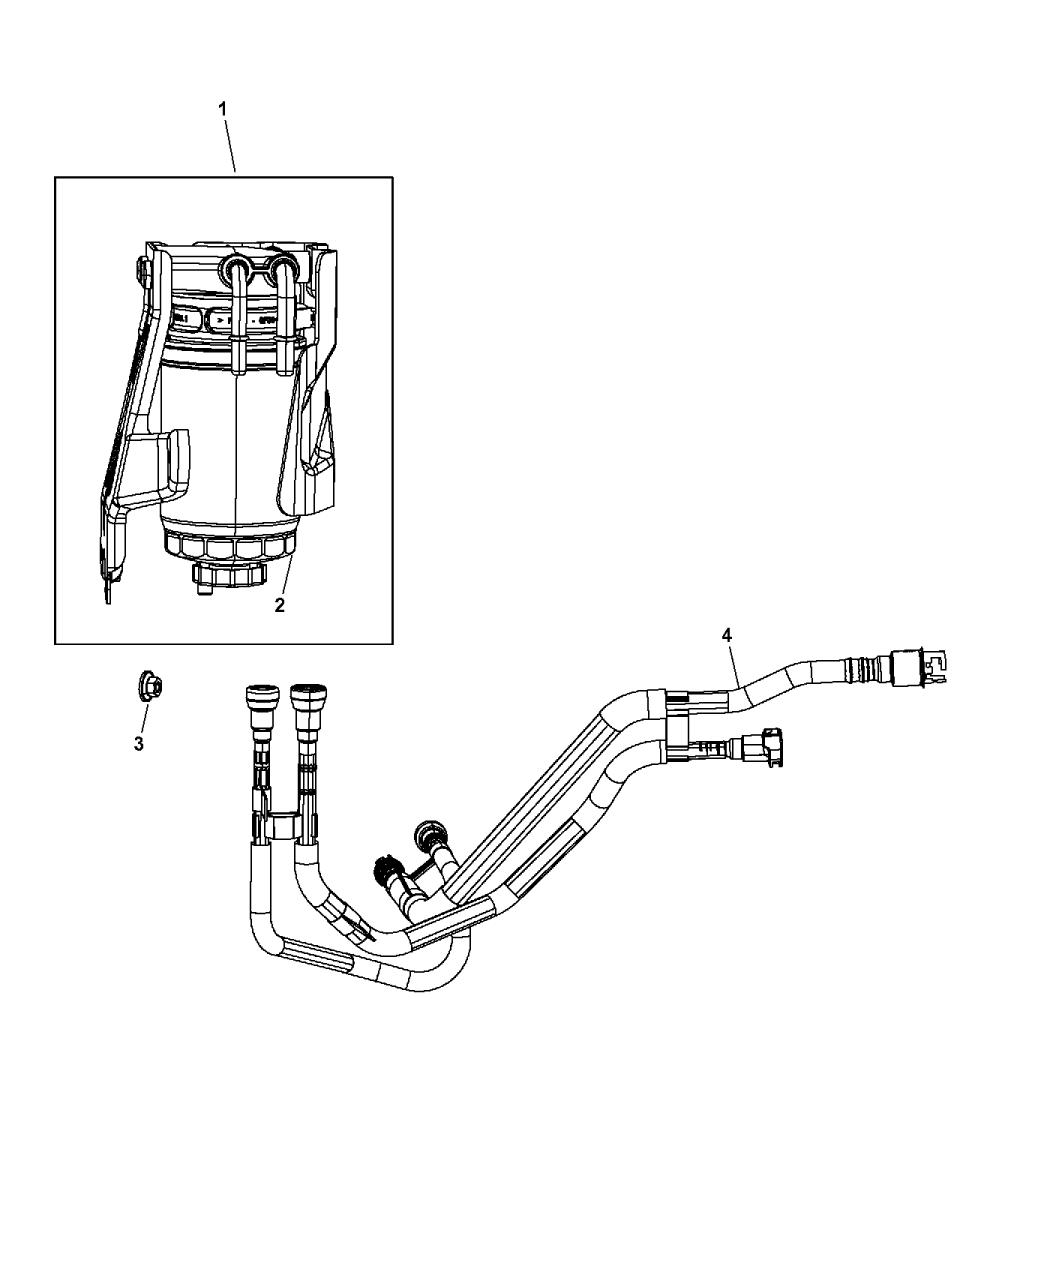 Jeep Patriot Fuel Filter